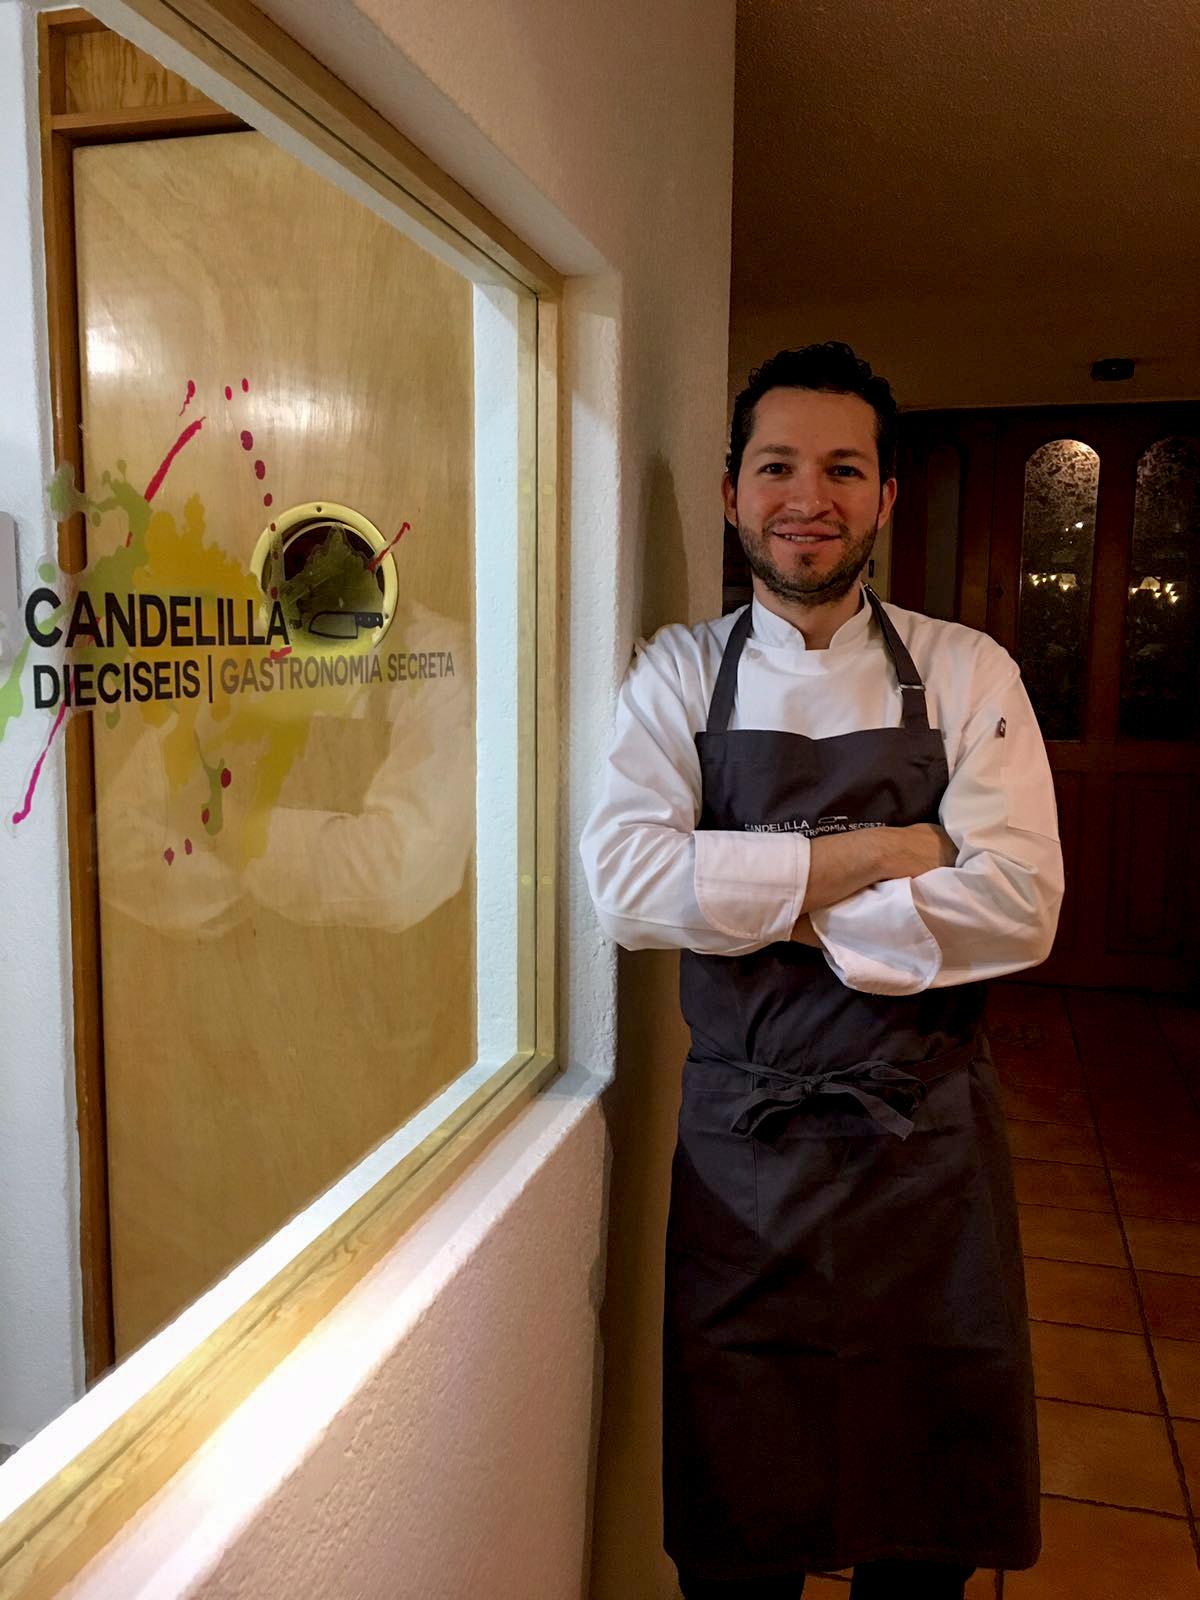 Candelilla 16